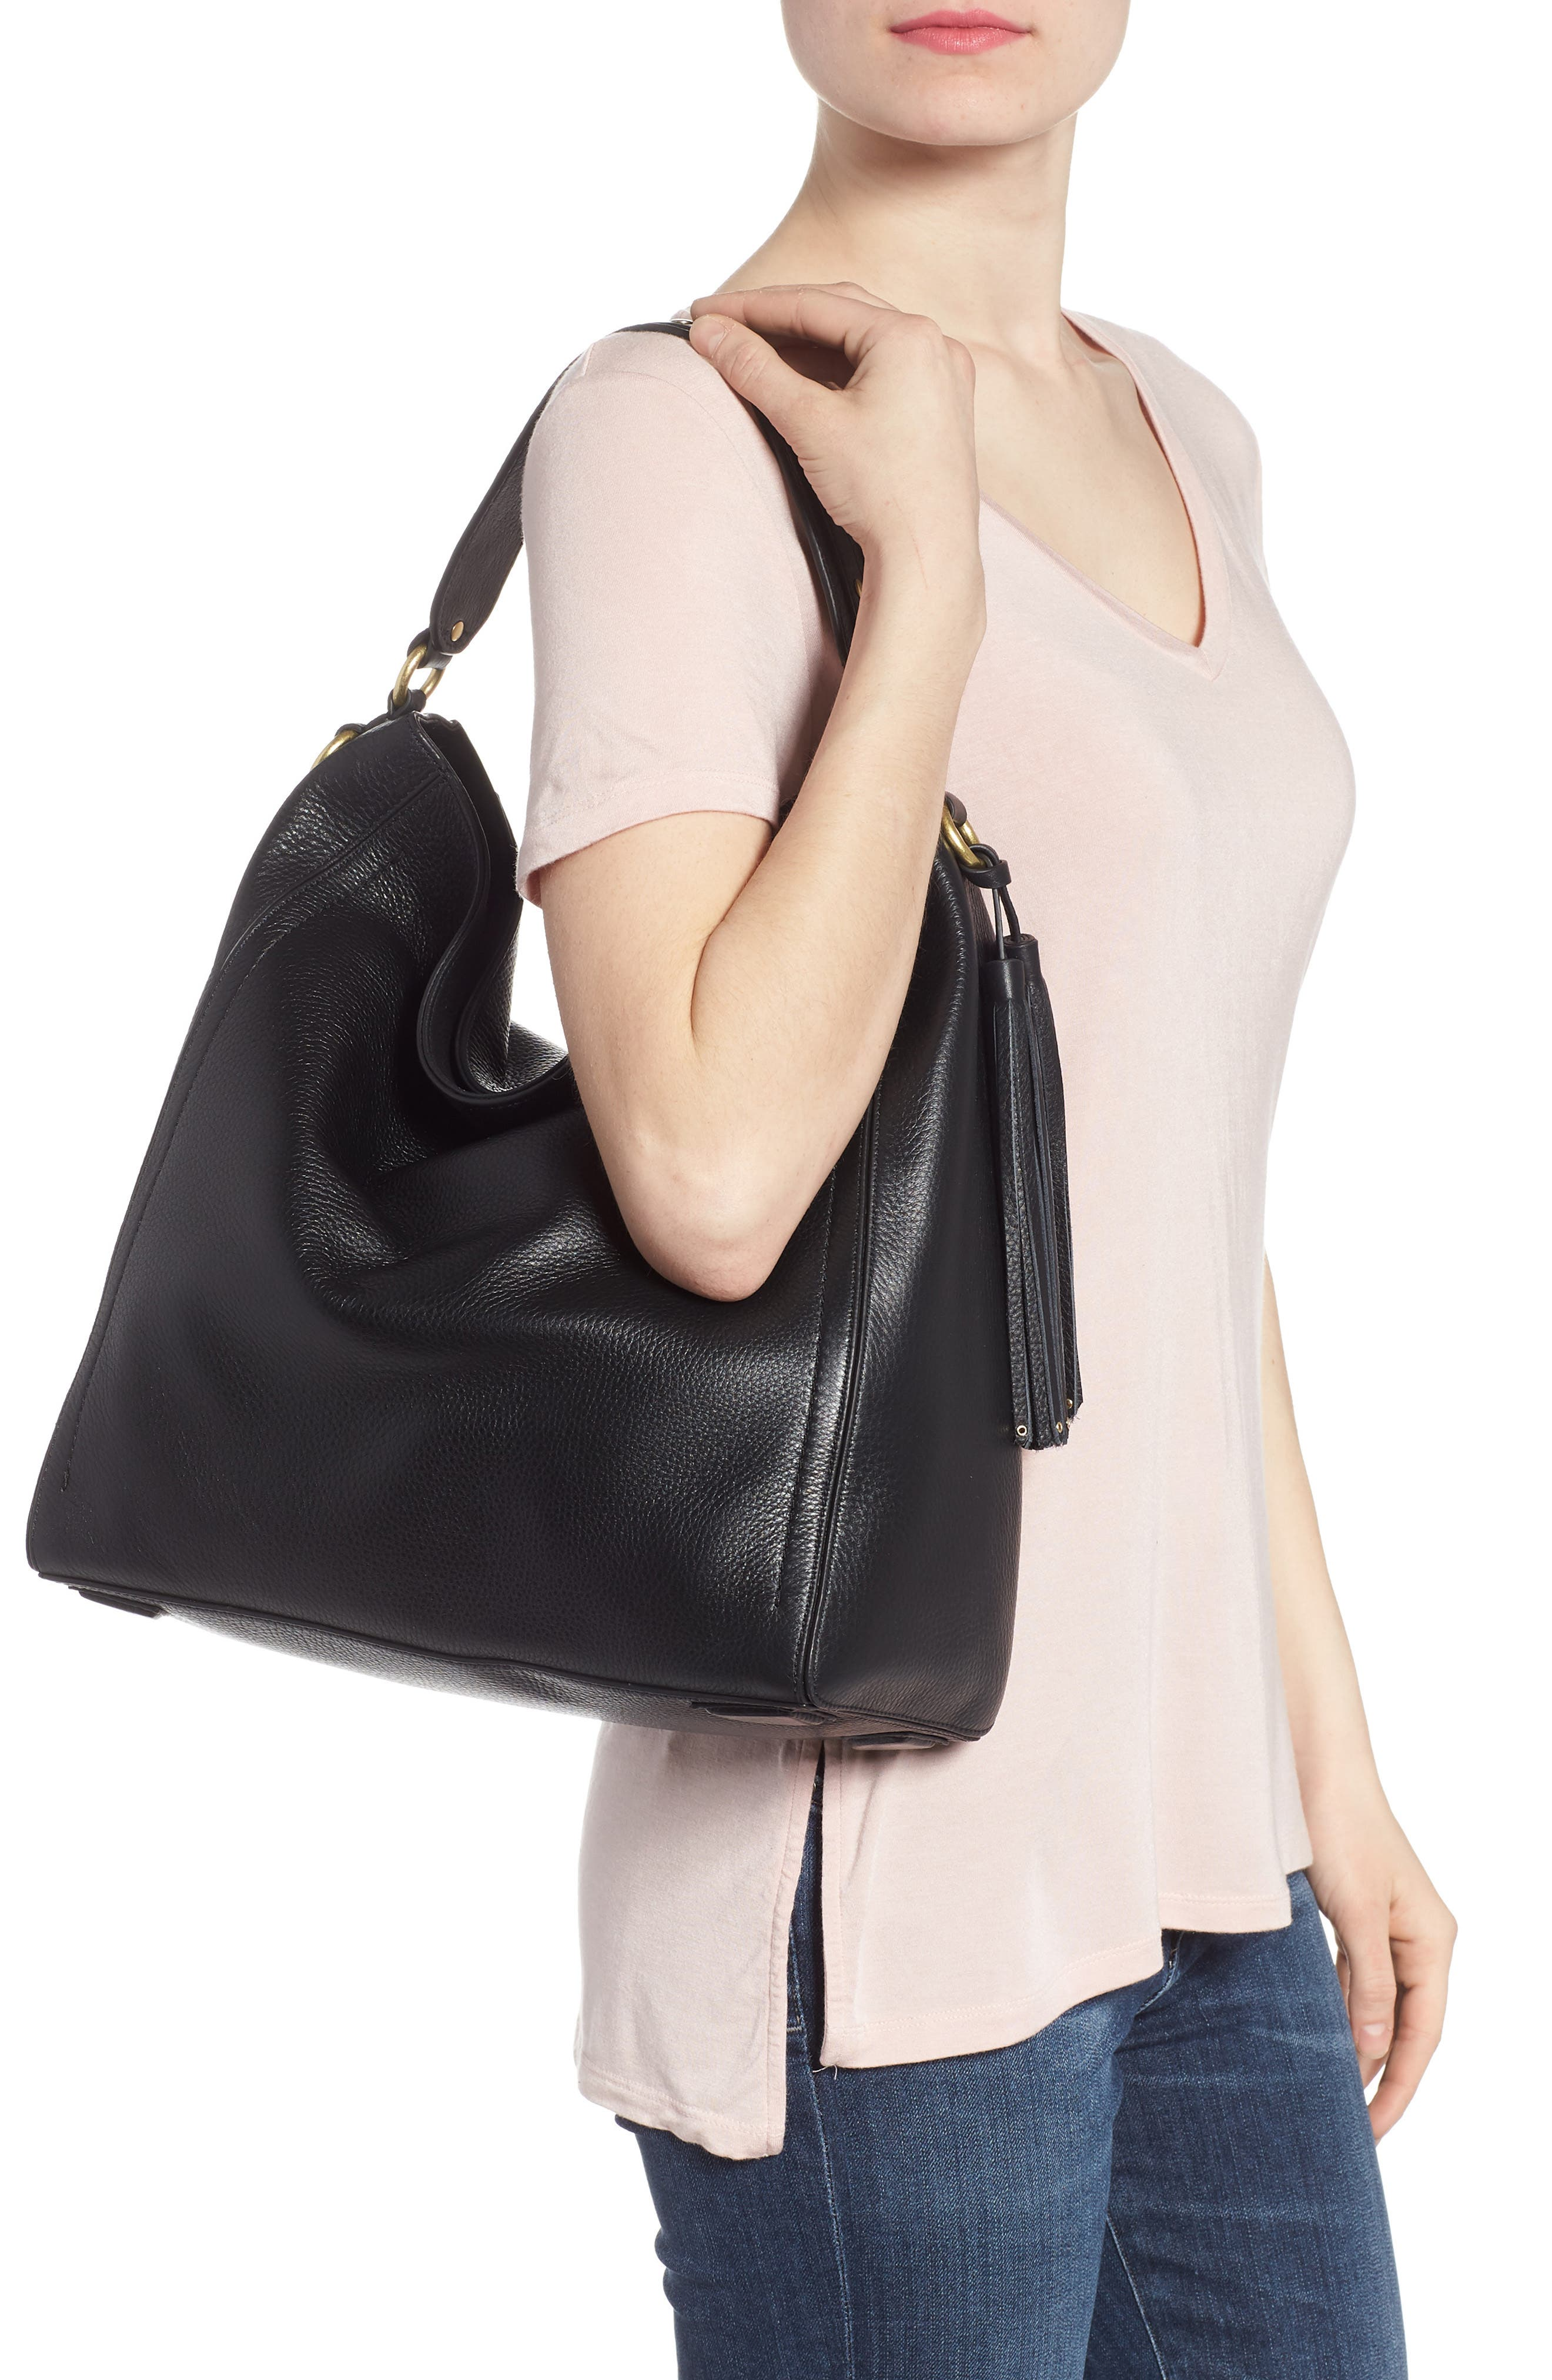 Cassidy RFID Pebbled Leather Bucket Bag,                             Alternate thumbnail 2, color,                             001